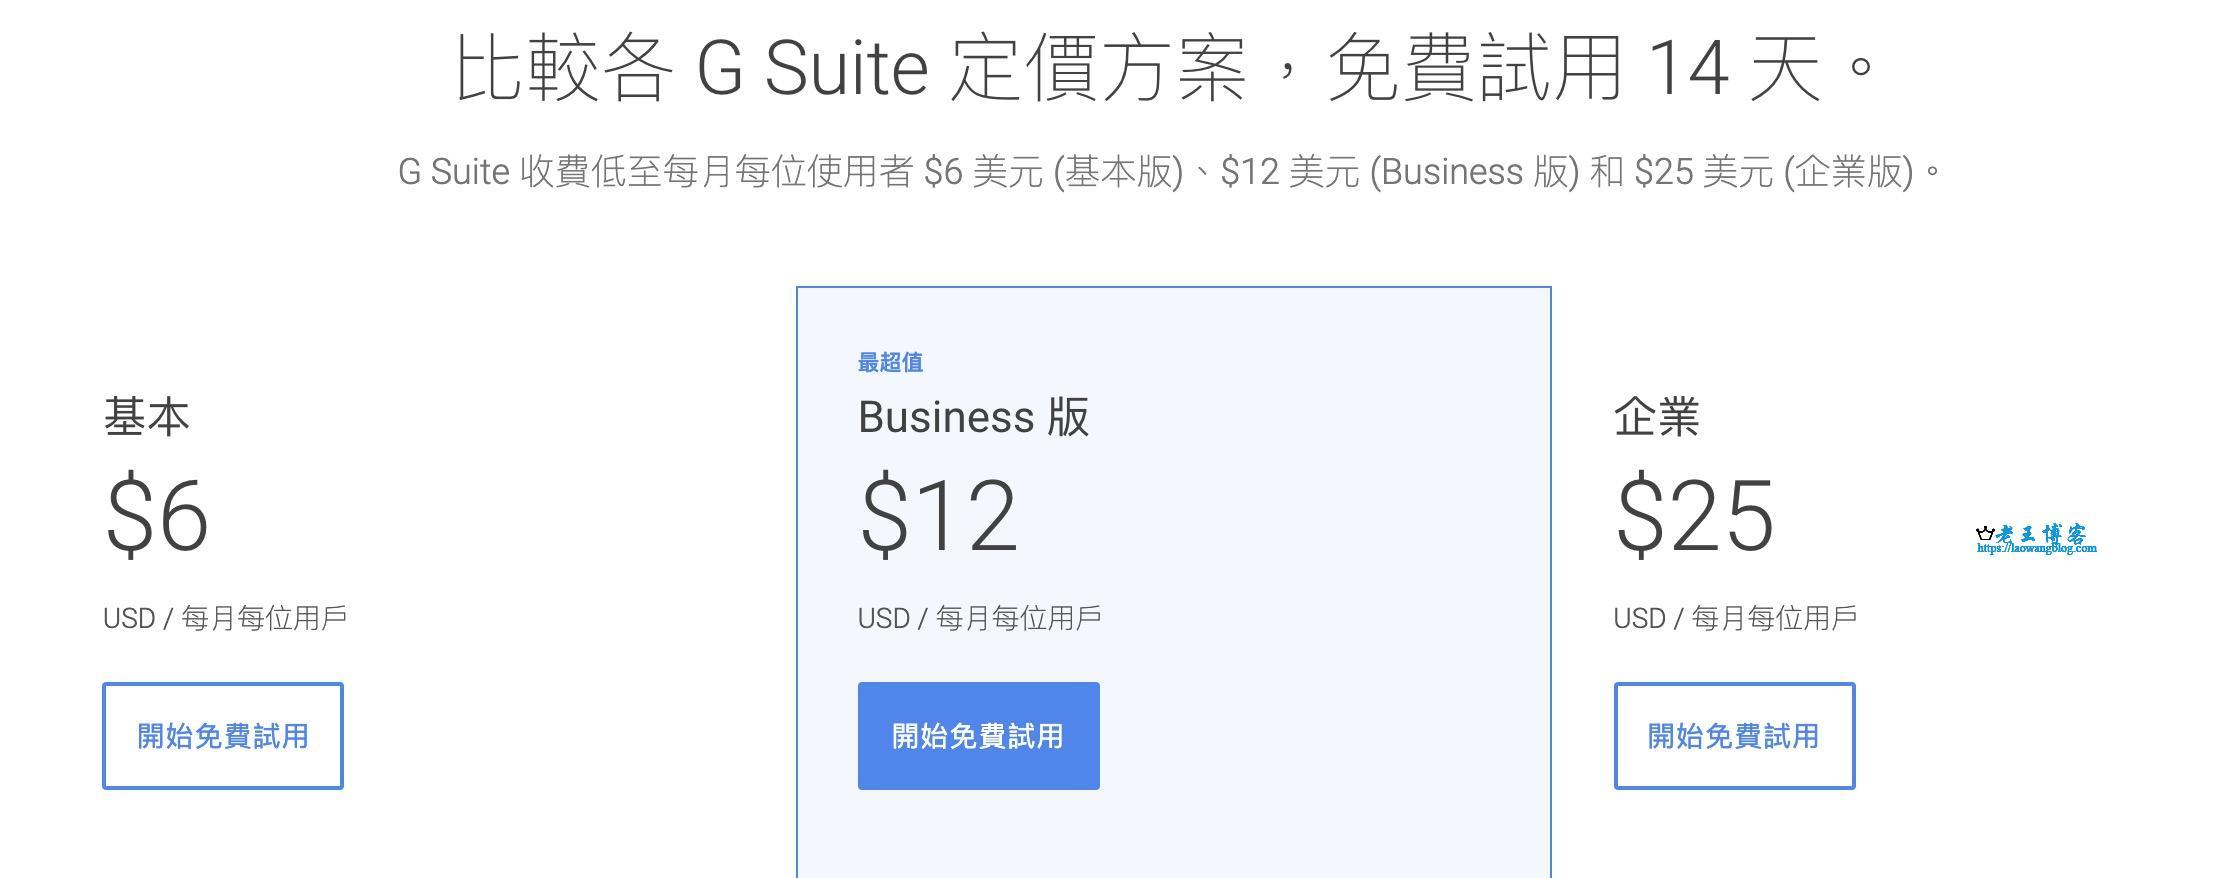 G Suite 价格